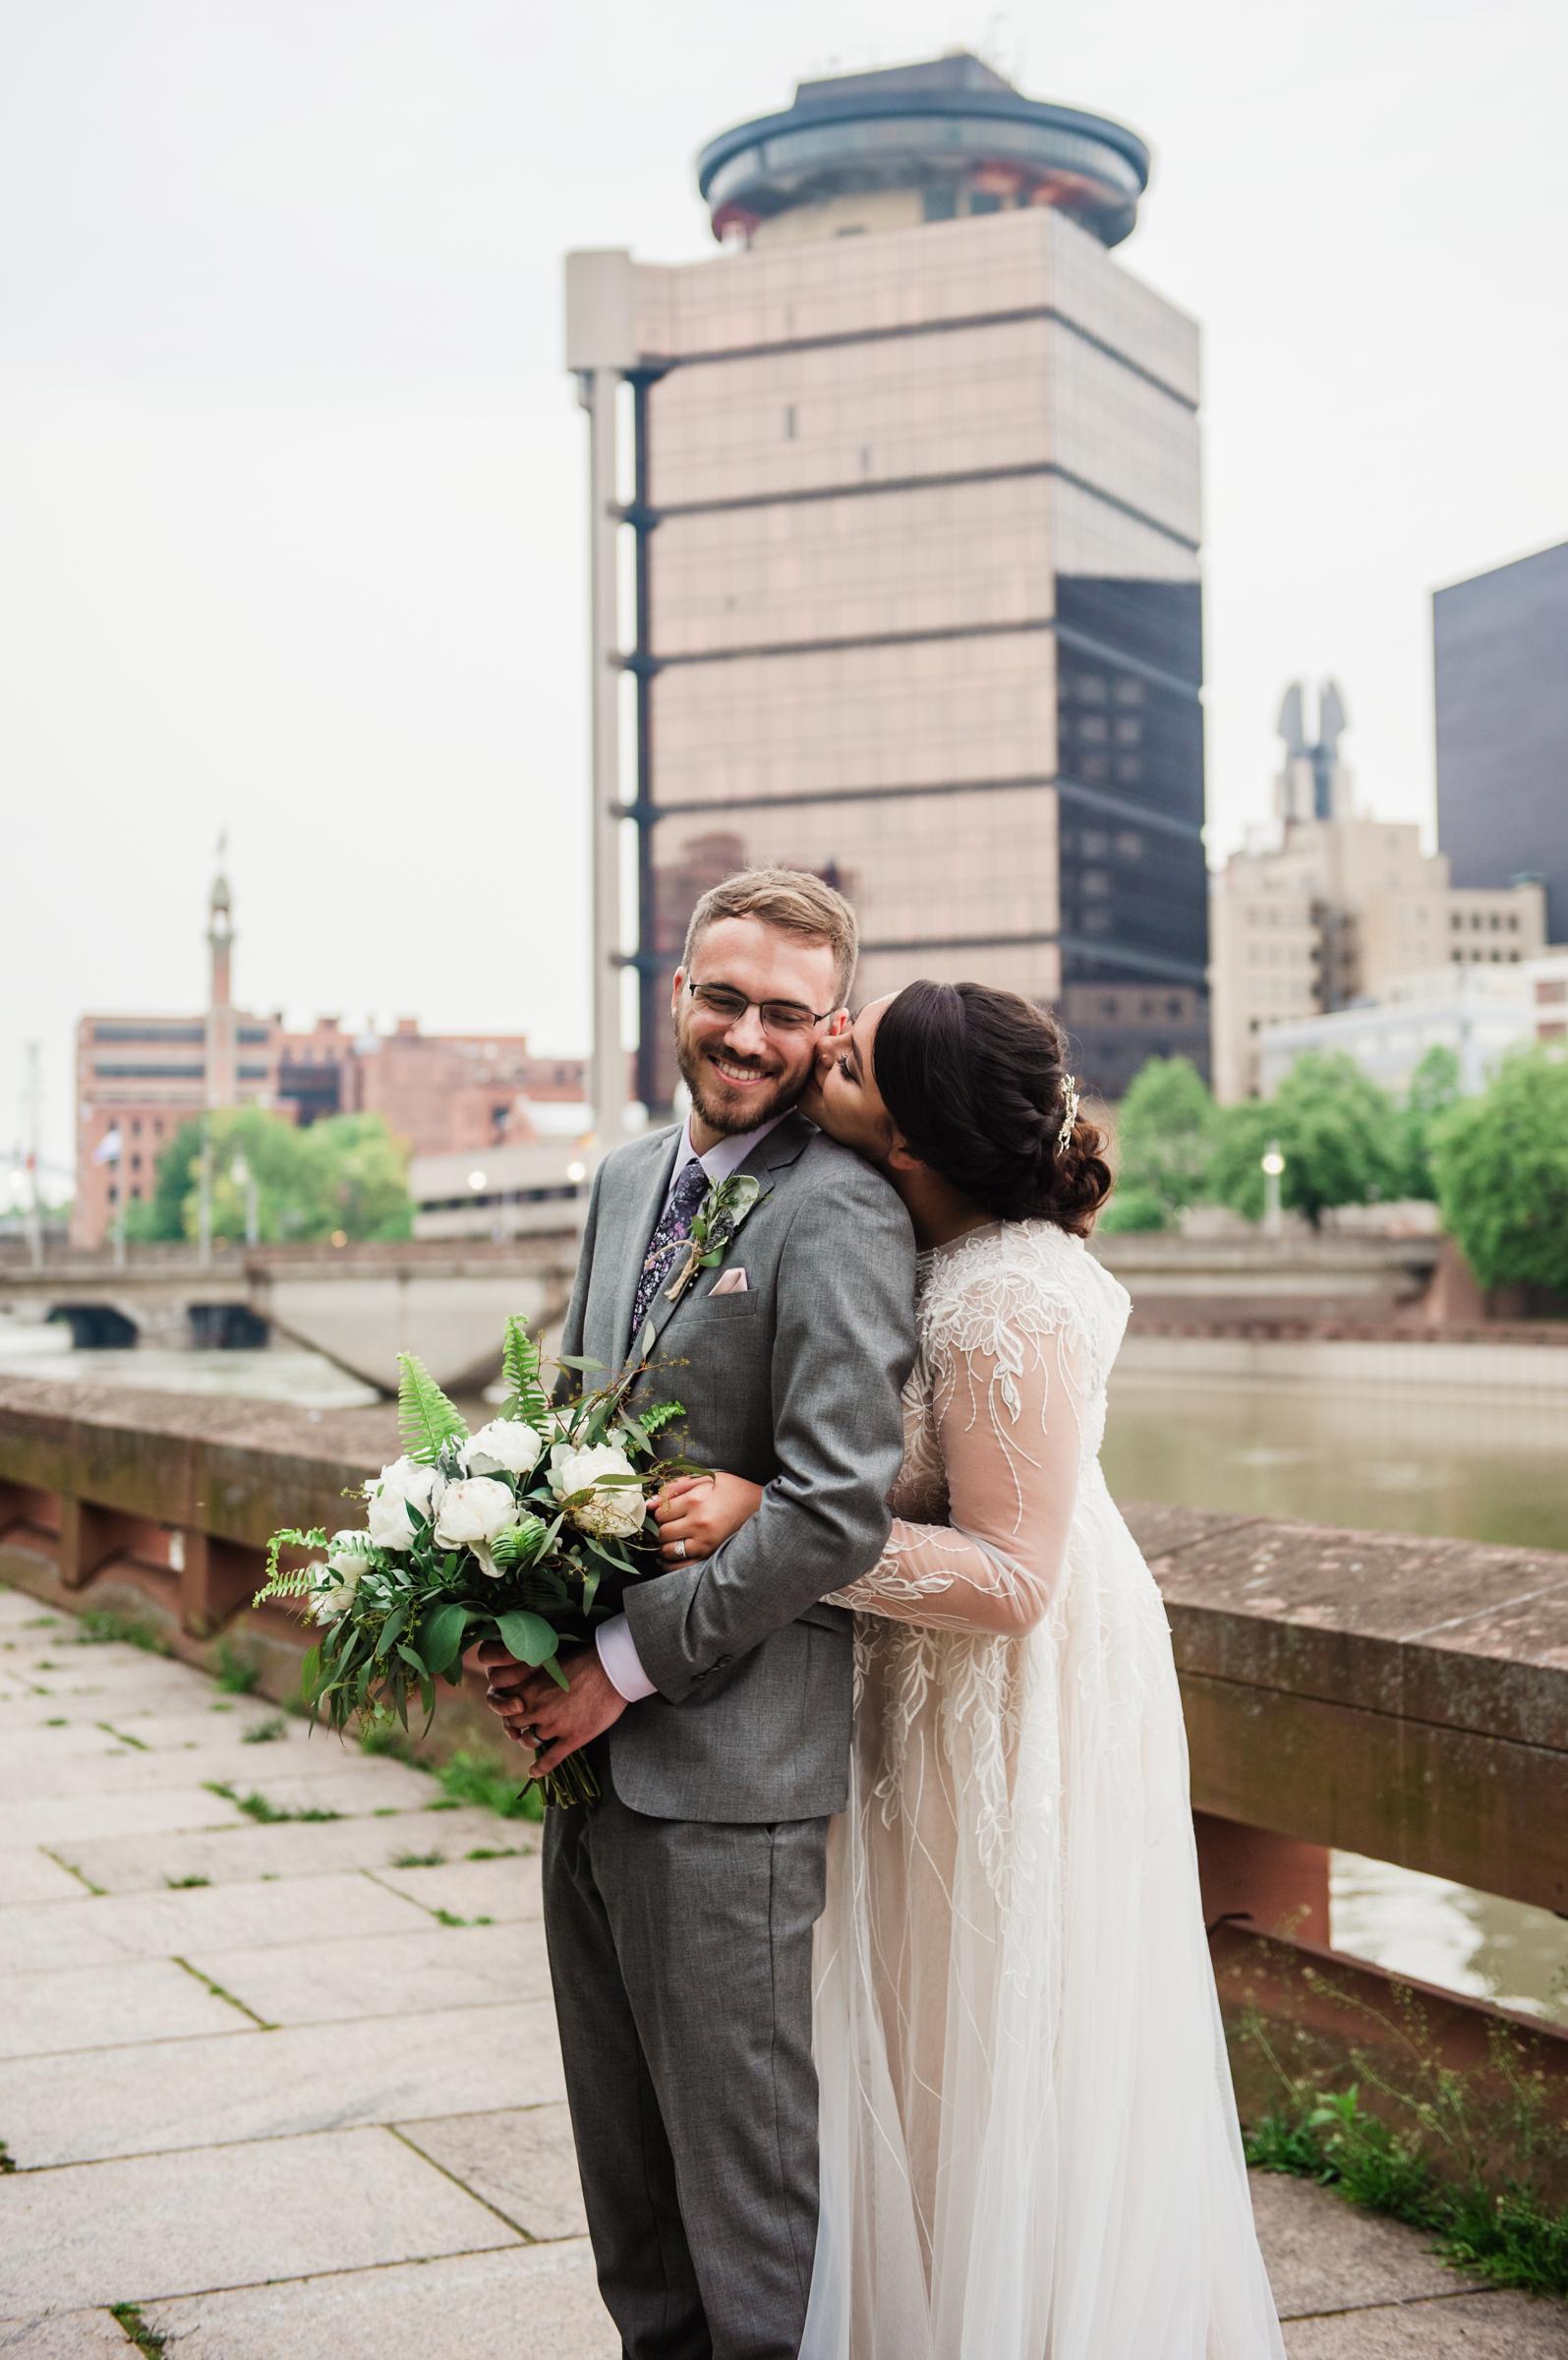 Studio_180_Lamberton_Conservatory_Rochester_Wedding_JILL_STUDIO_Rochester_NY_Photographer_DSC_9050.jpg